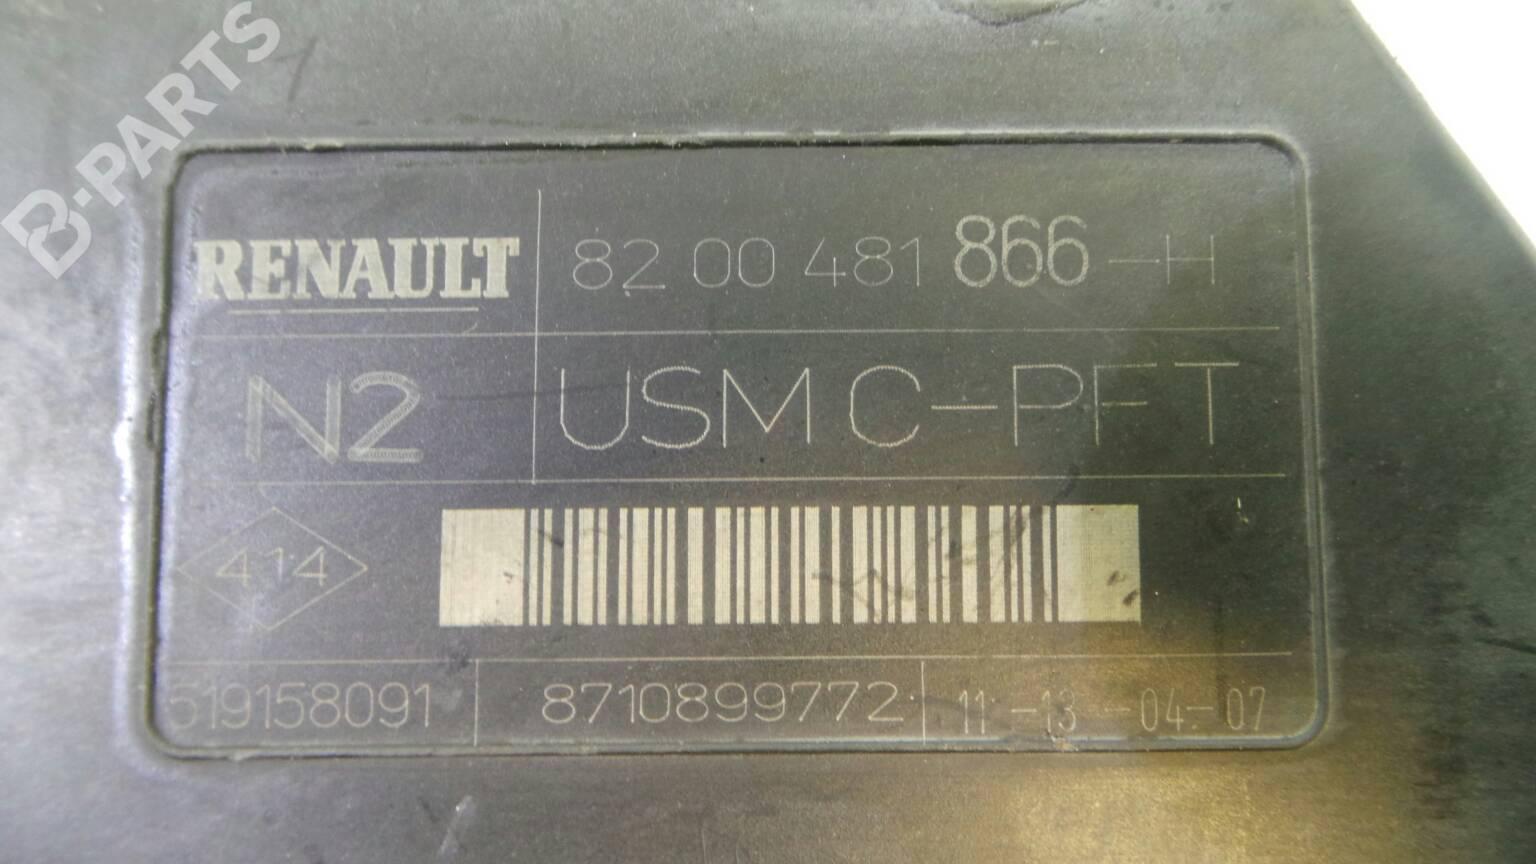 hight resolution of  fuse box 8200 481 866 h renault megane ii bm0 1 cm0